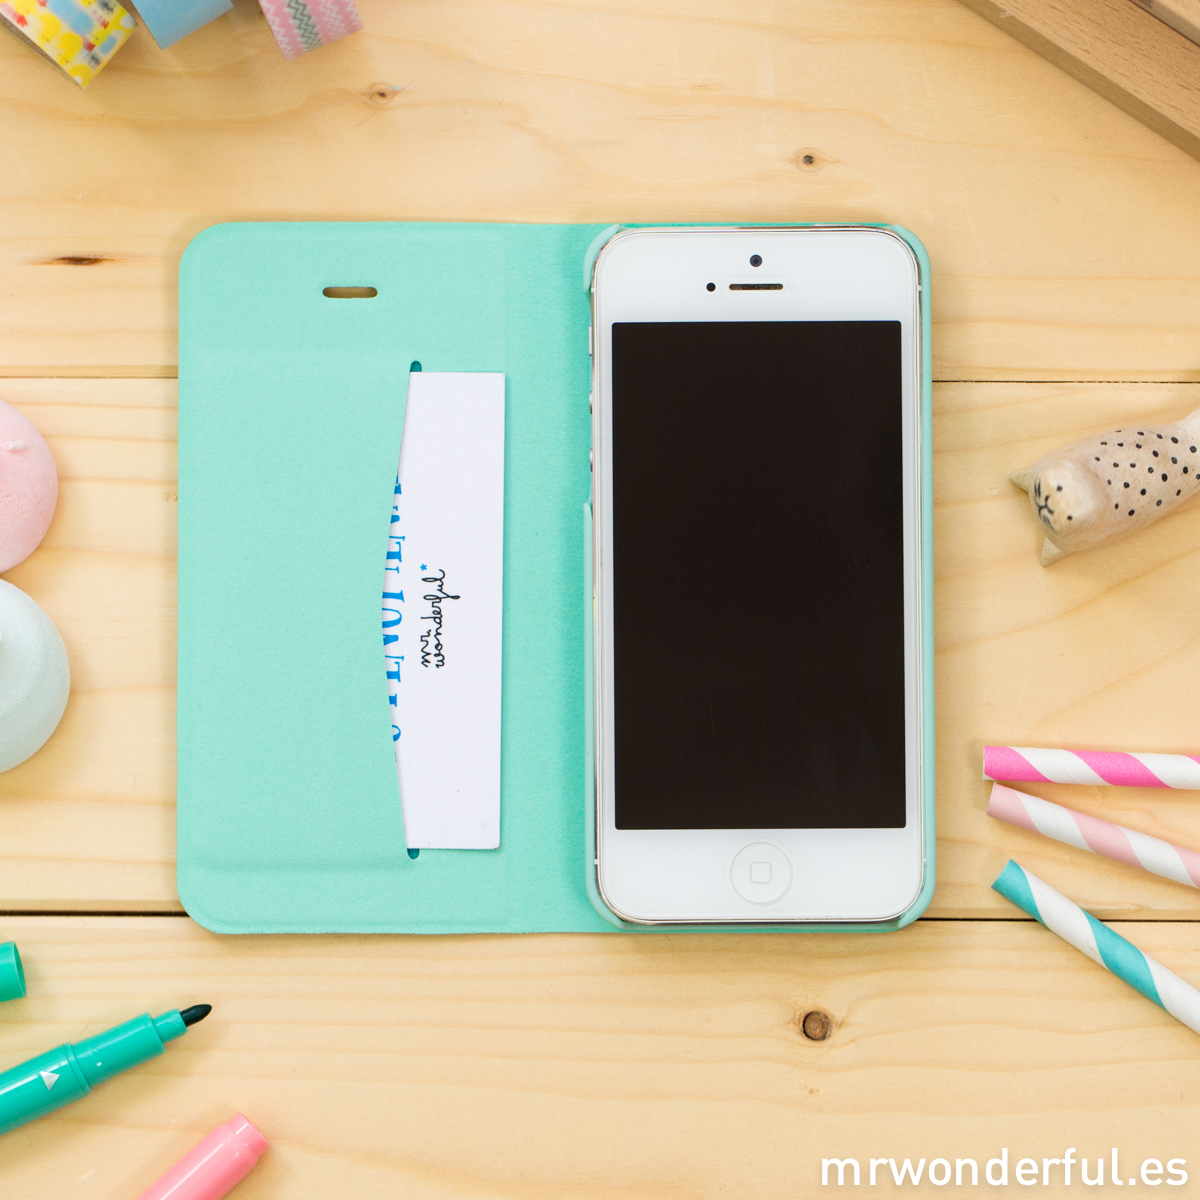 mrwonderful_8436557680112_MRFOL009_funda-libro-iphone-5-5s-momentos-MW-18